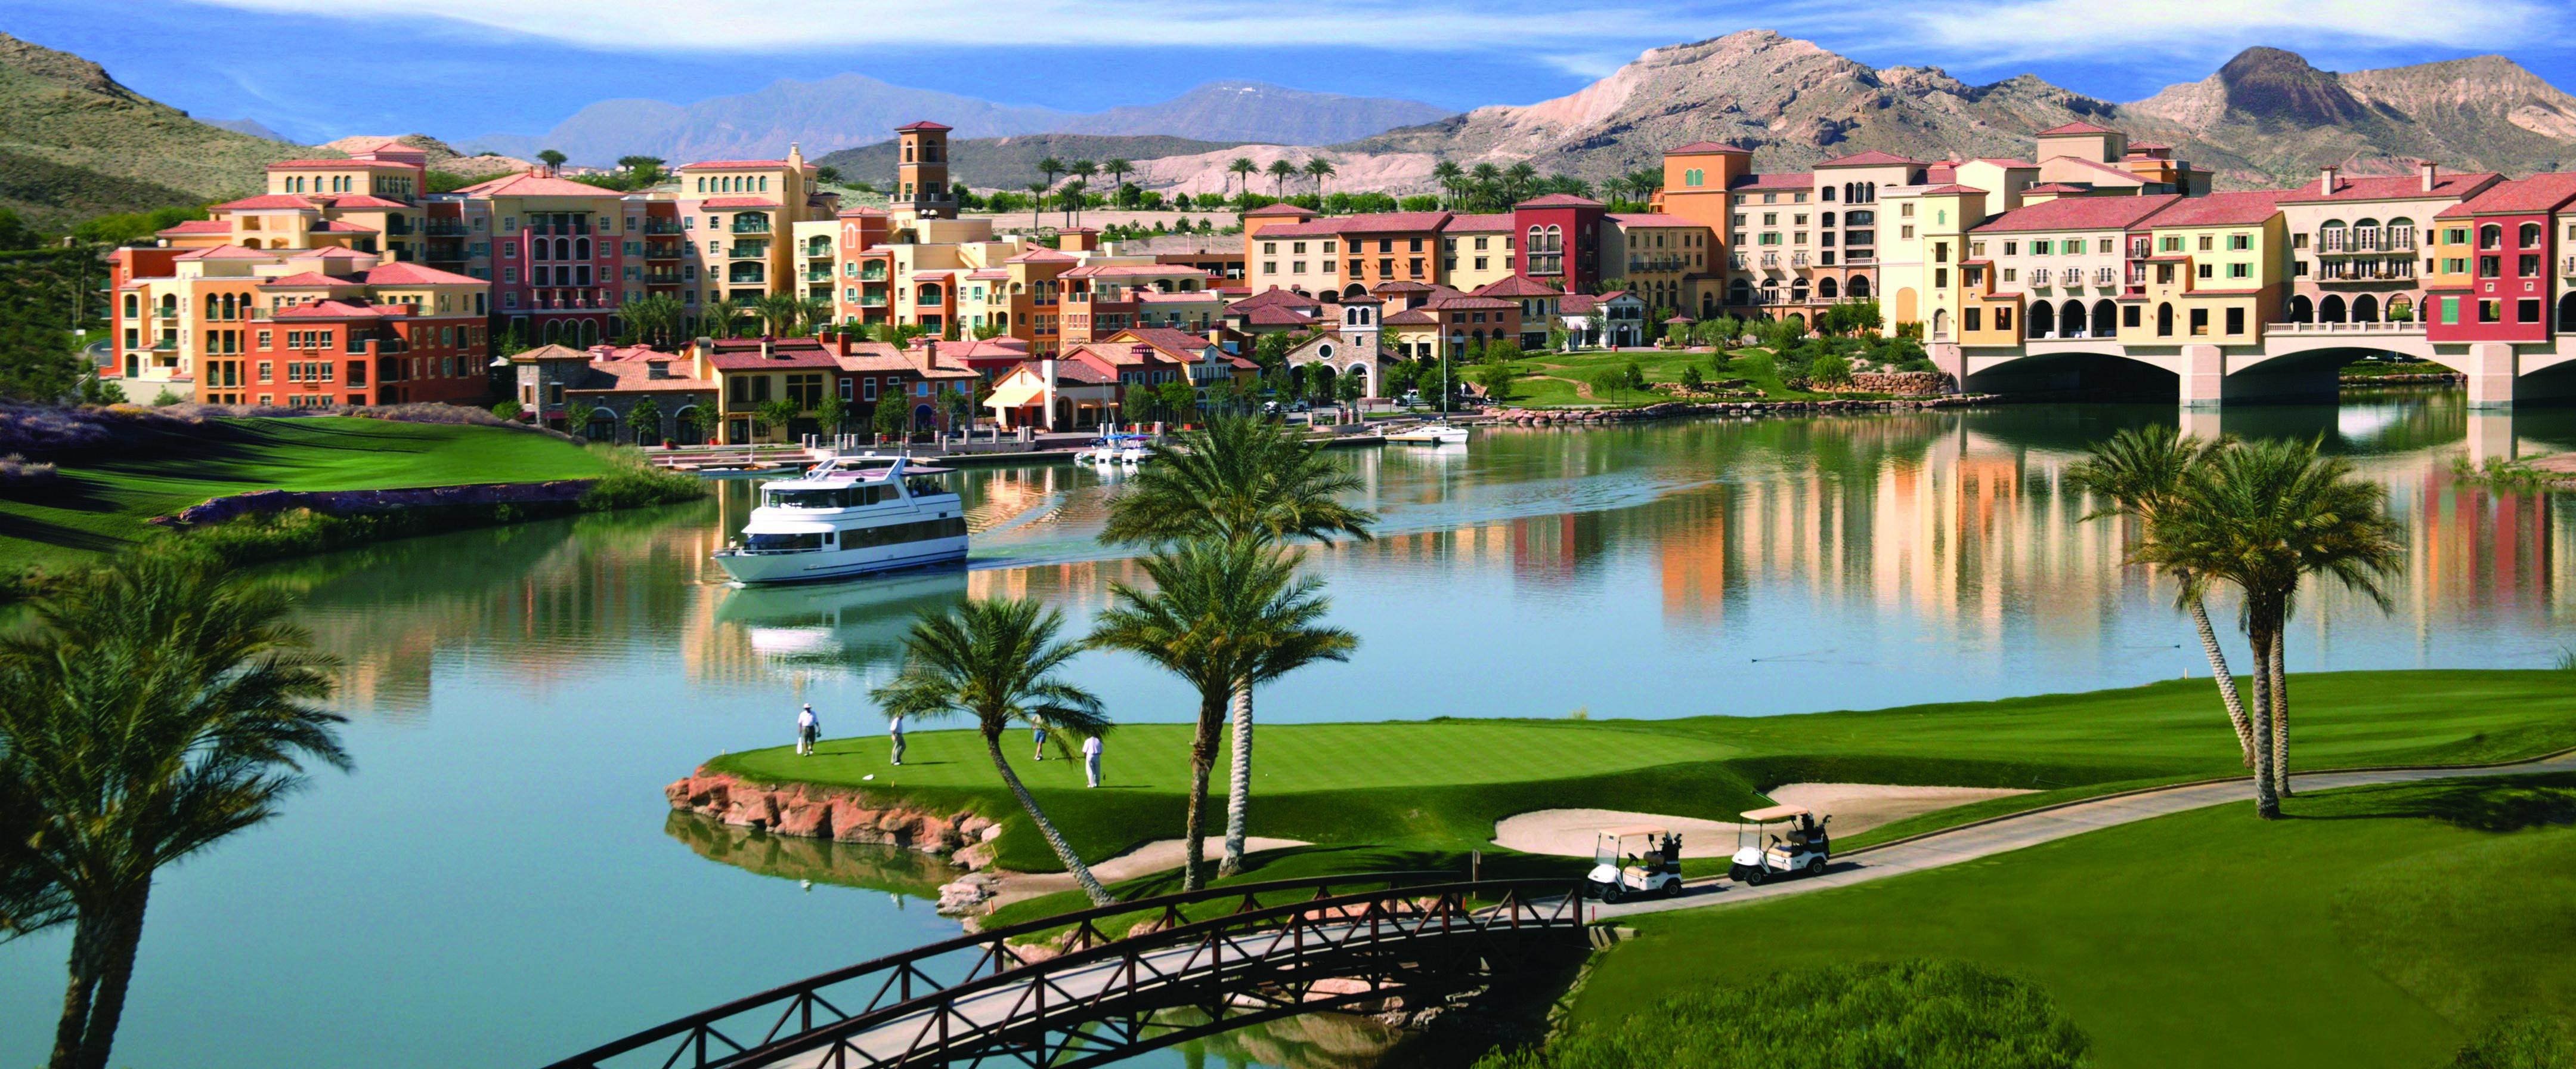 Tuscana Resort Orlando By Aston Immee Fl United States